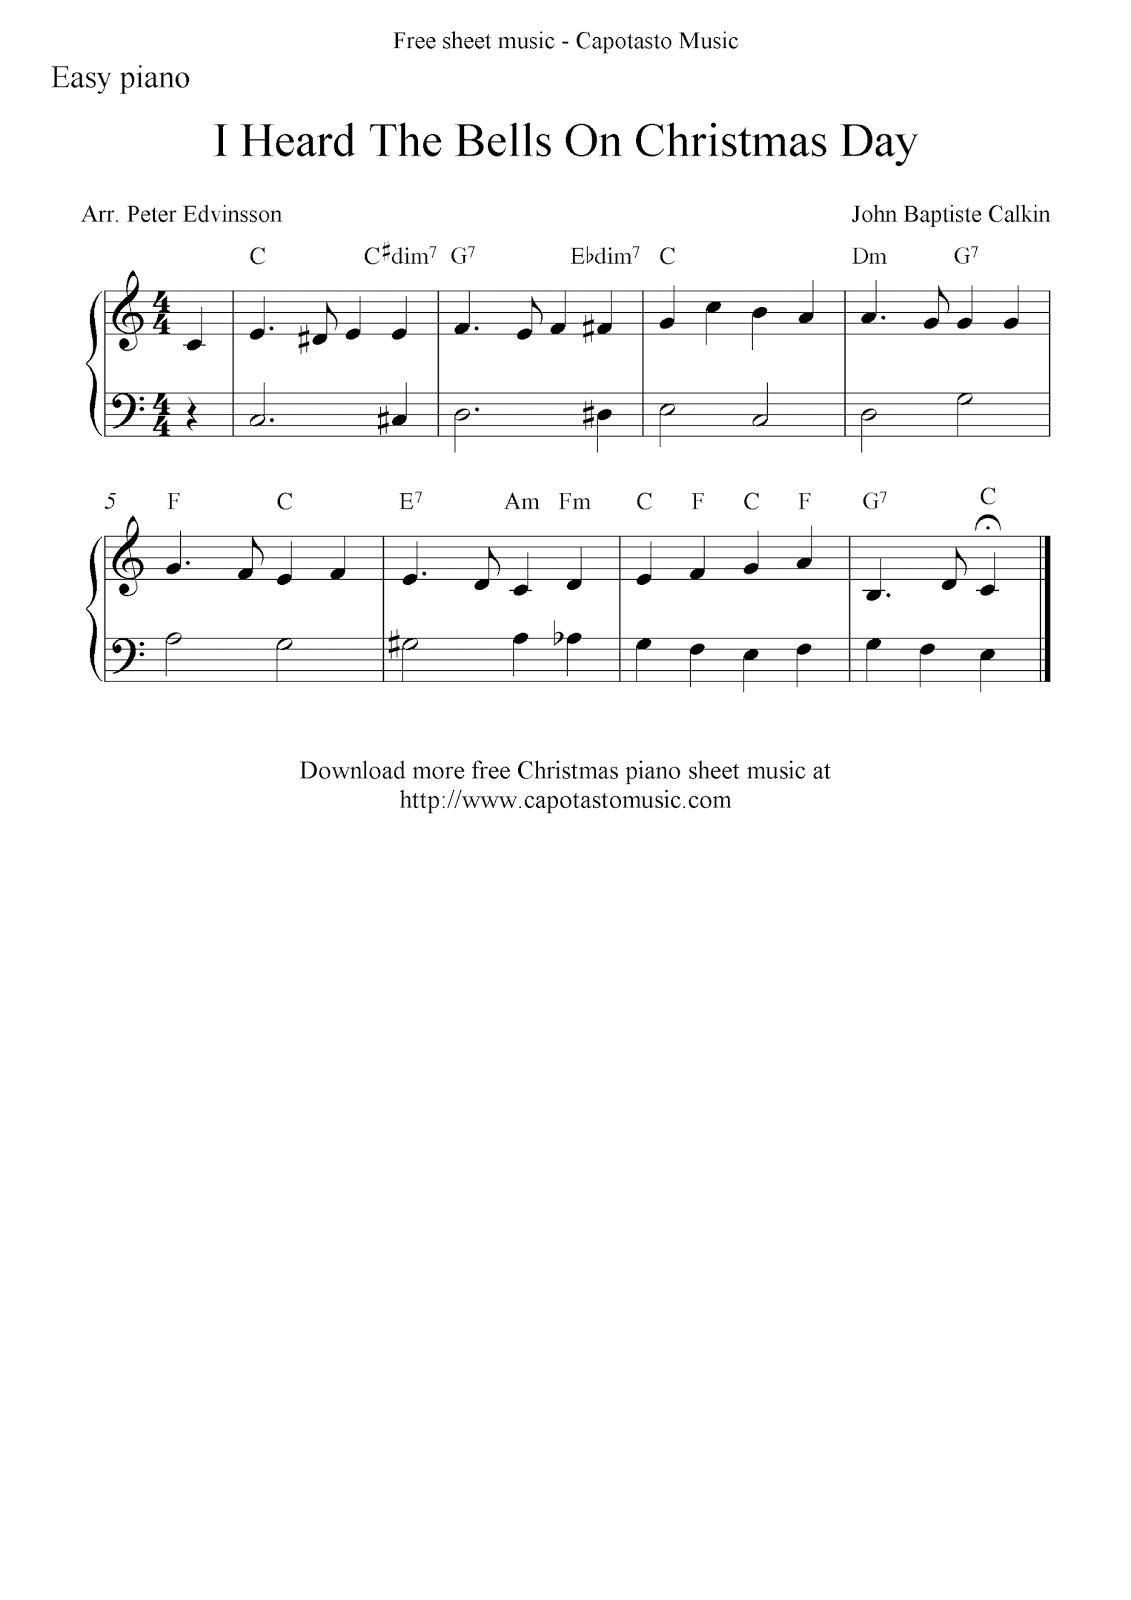 picture regarding Carol of the Bells Free Printable Sheet Music called September 2011